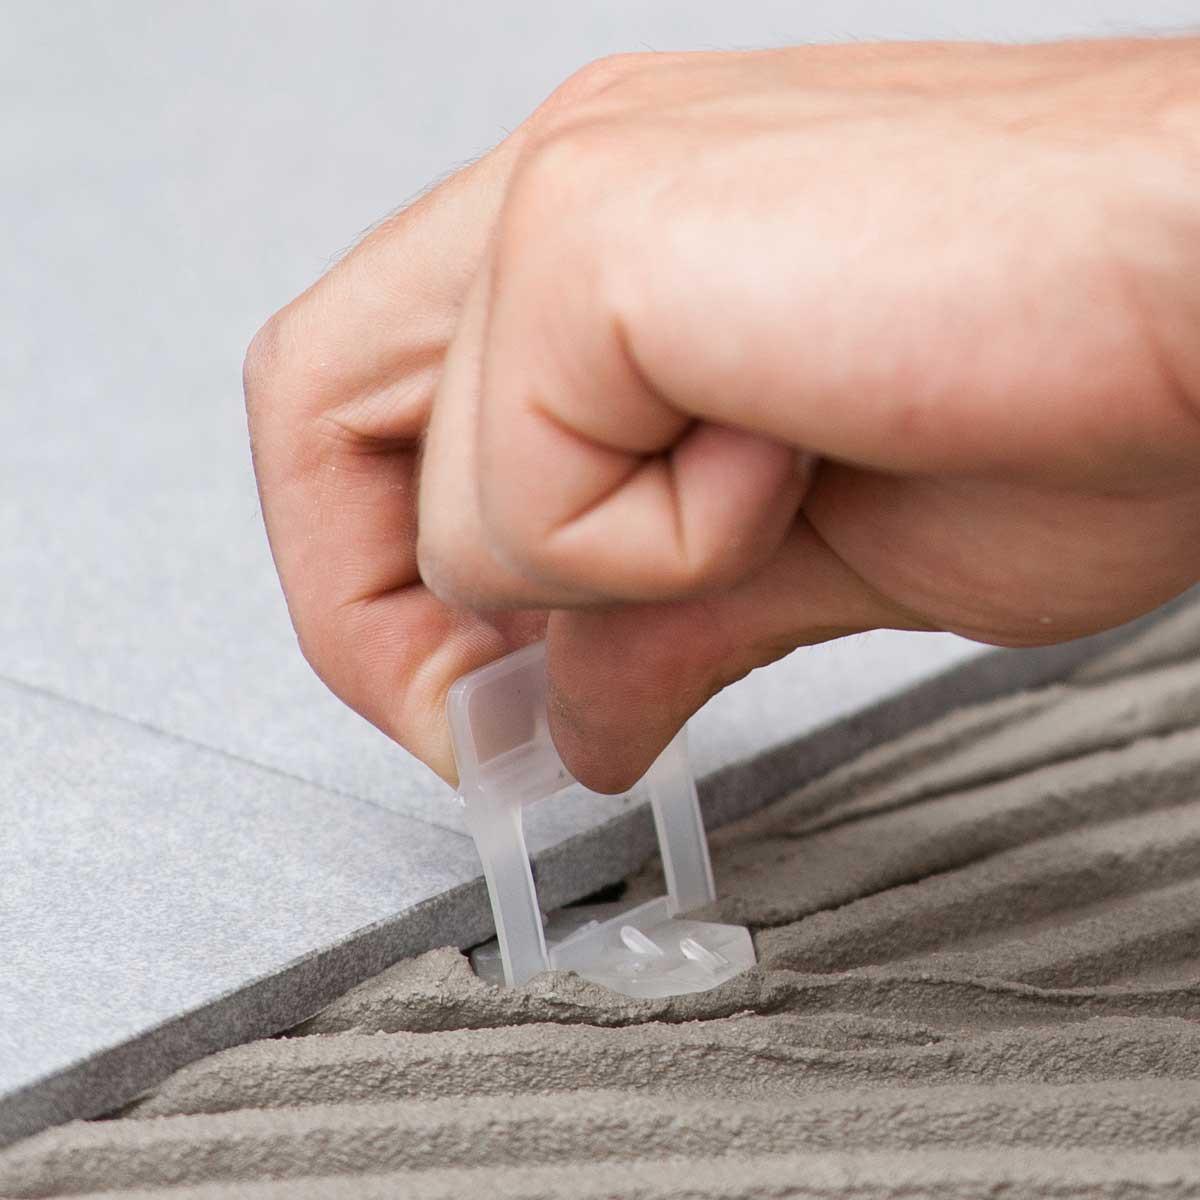 raimondi 1/32in clip tile installation use